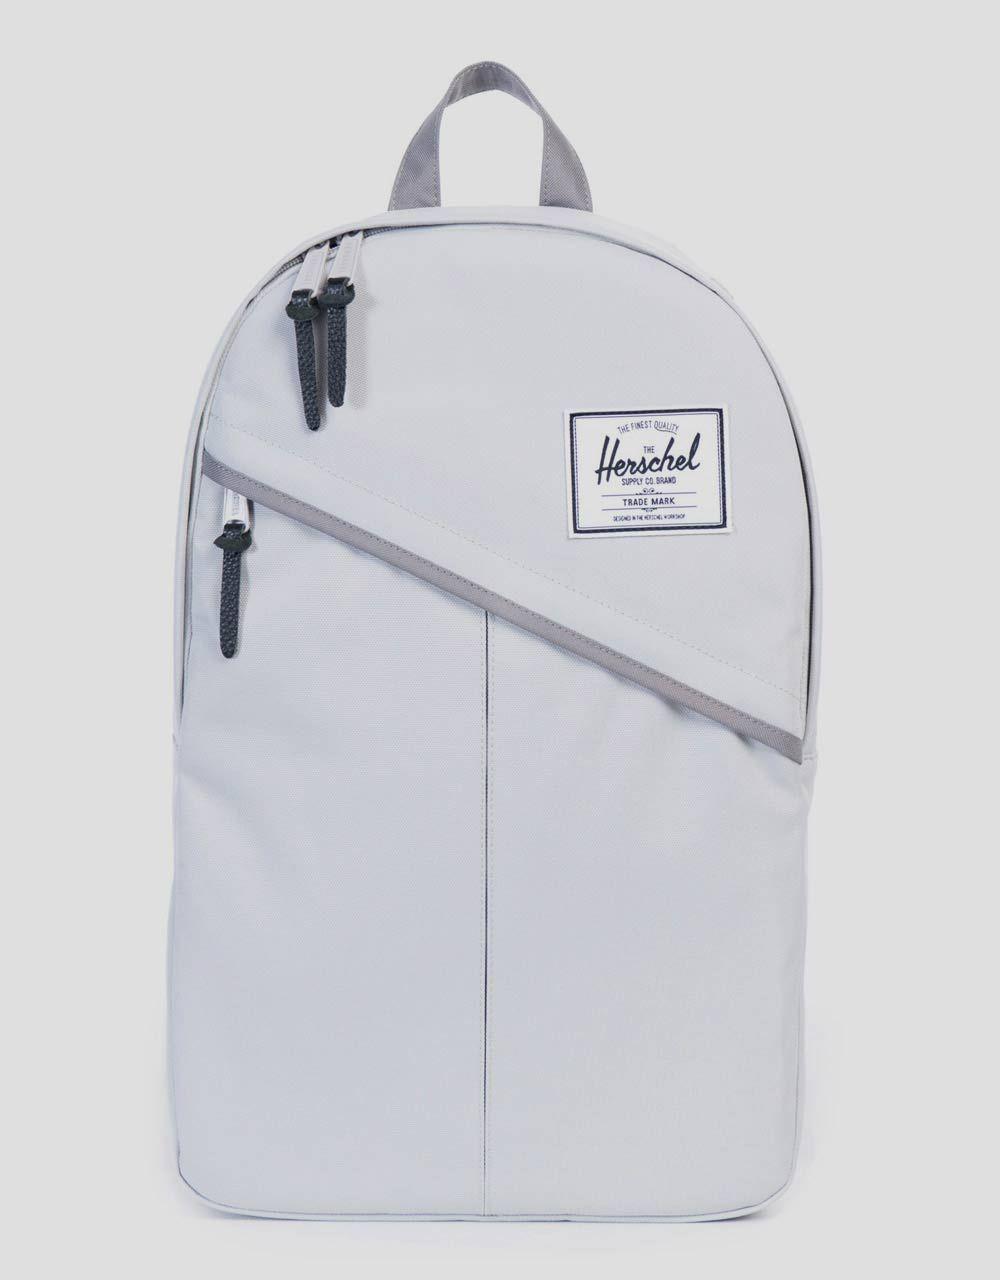 2ed30839b02 Herschel Supply Co. Parker Backpack - Lunar Rock Grey - RouteOne.co ...